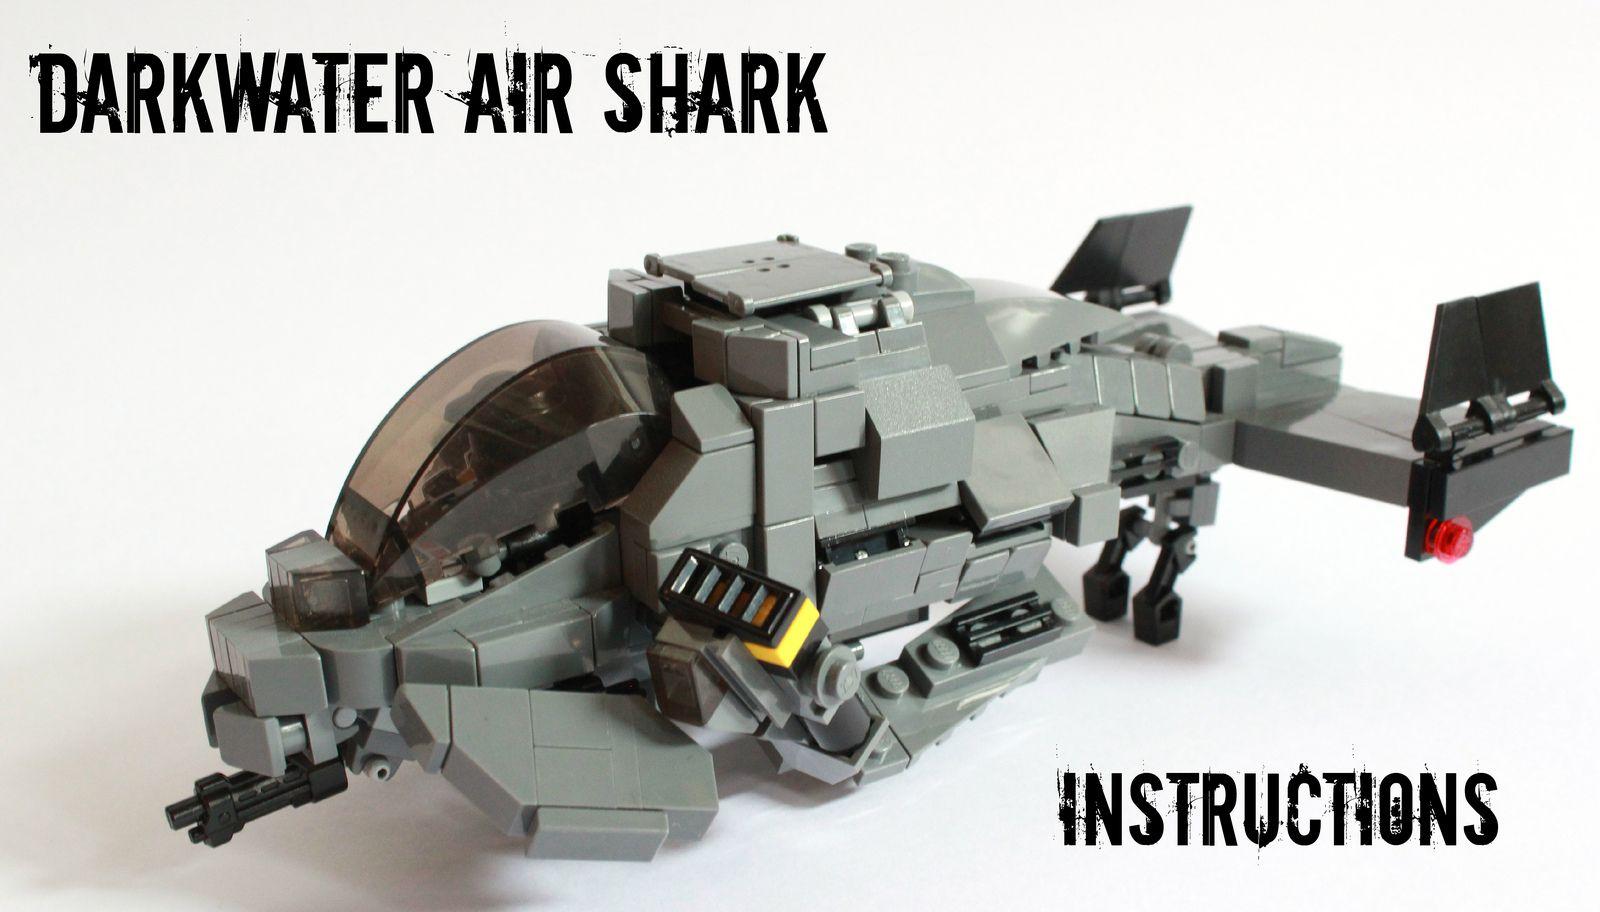 Air Shark Instructions Lego Vehicles Pinterest Shark Lego